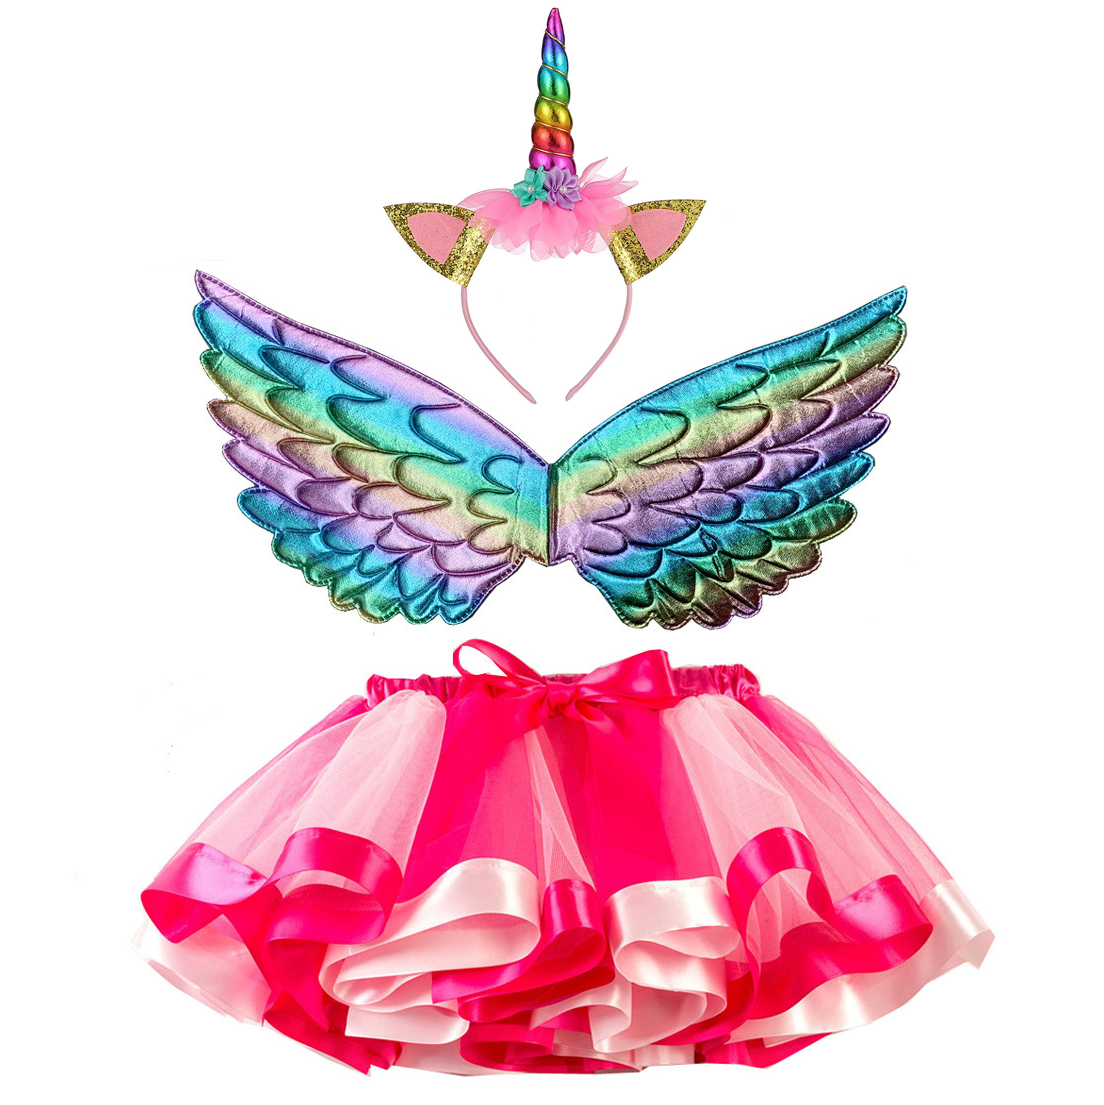 Carneval Party Kids Head Animal Costume Kostim Children New Years Eve Unicorn Costume For Girls